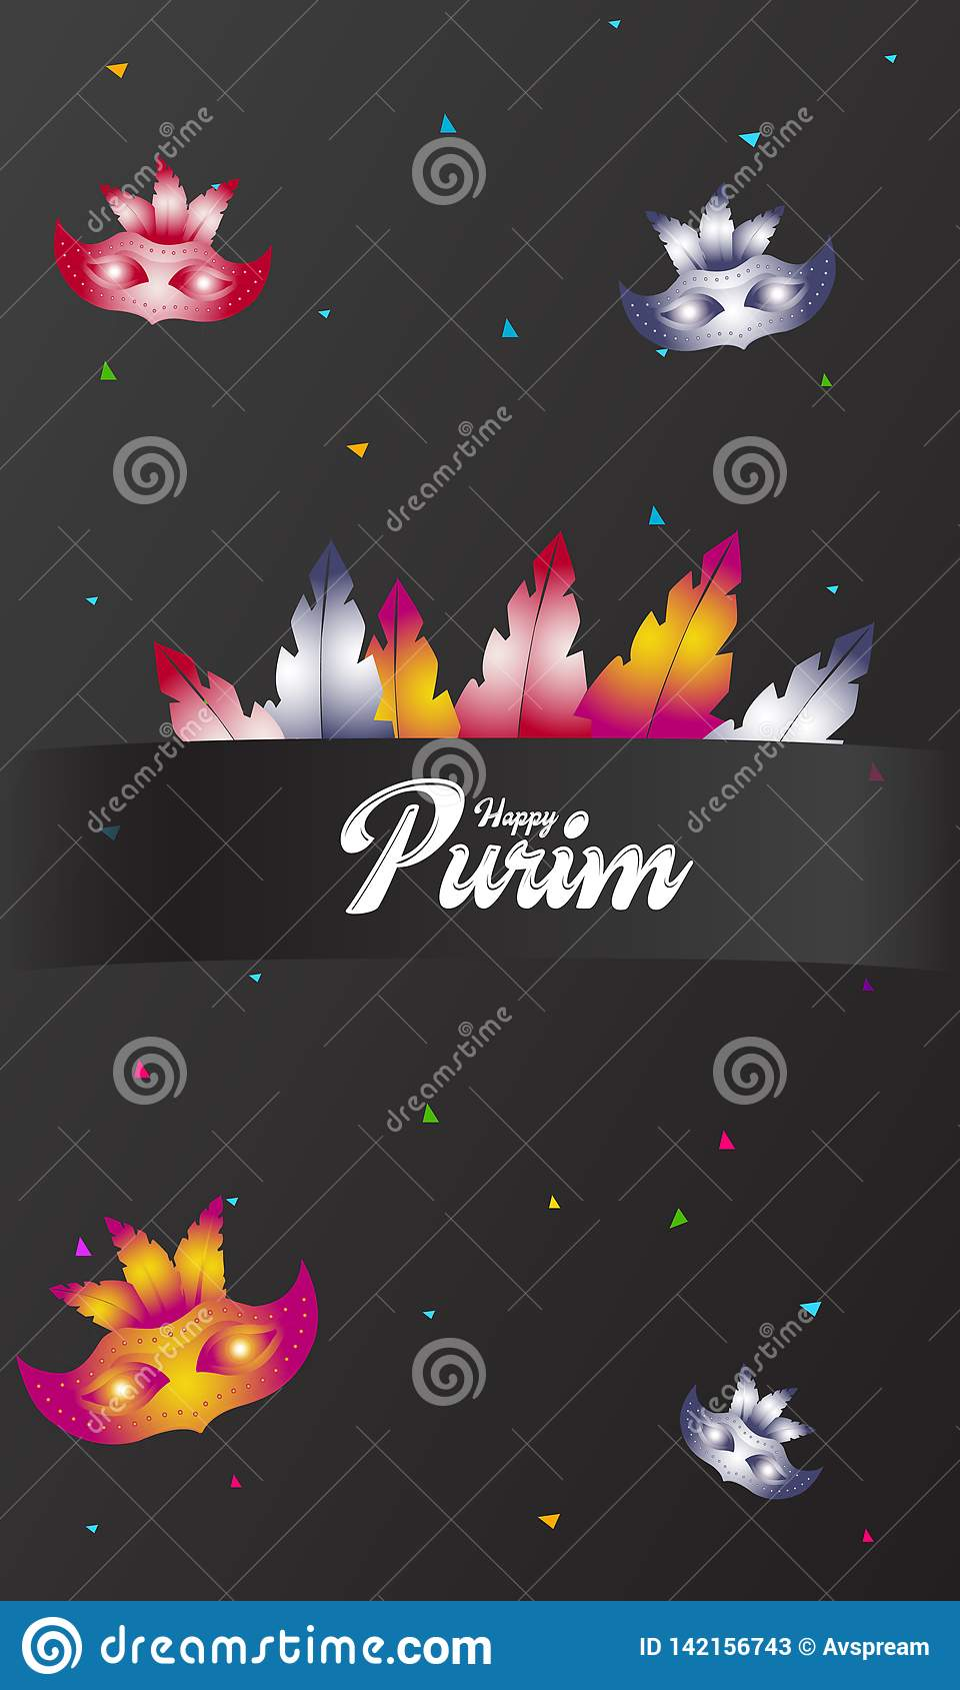 Happy Purim, jewish celebration party invitation (Happy Purim in Hebrew). Carnival mask